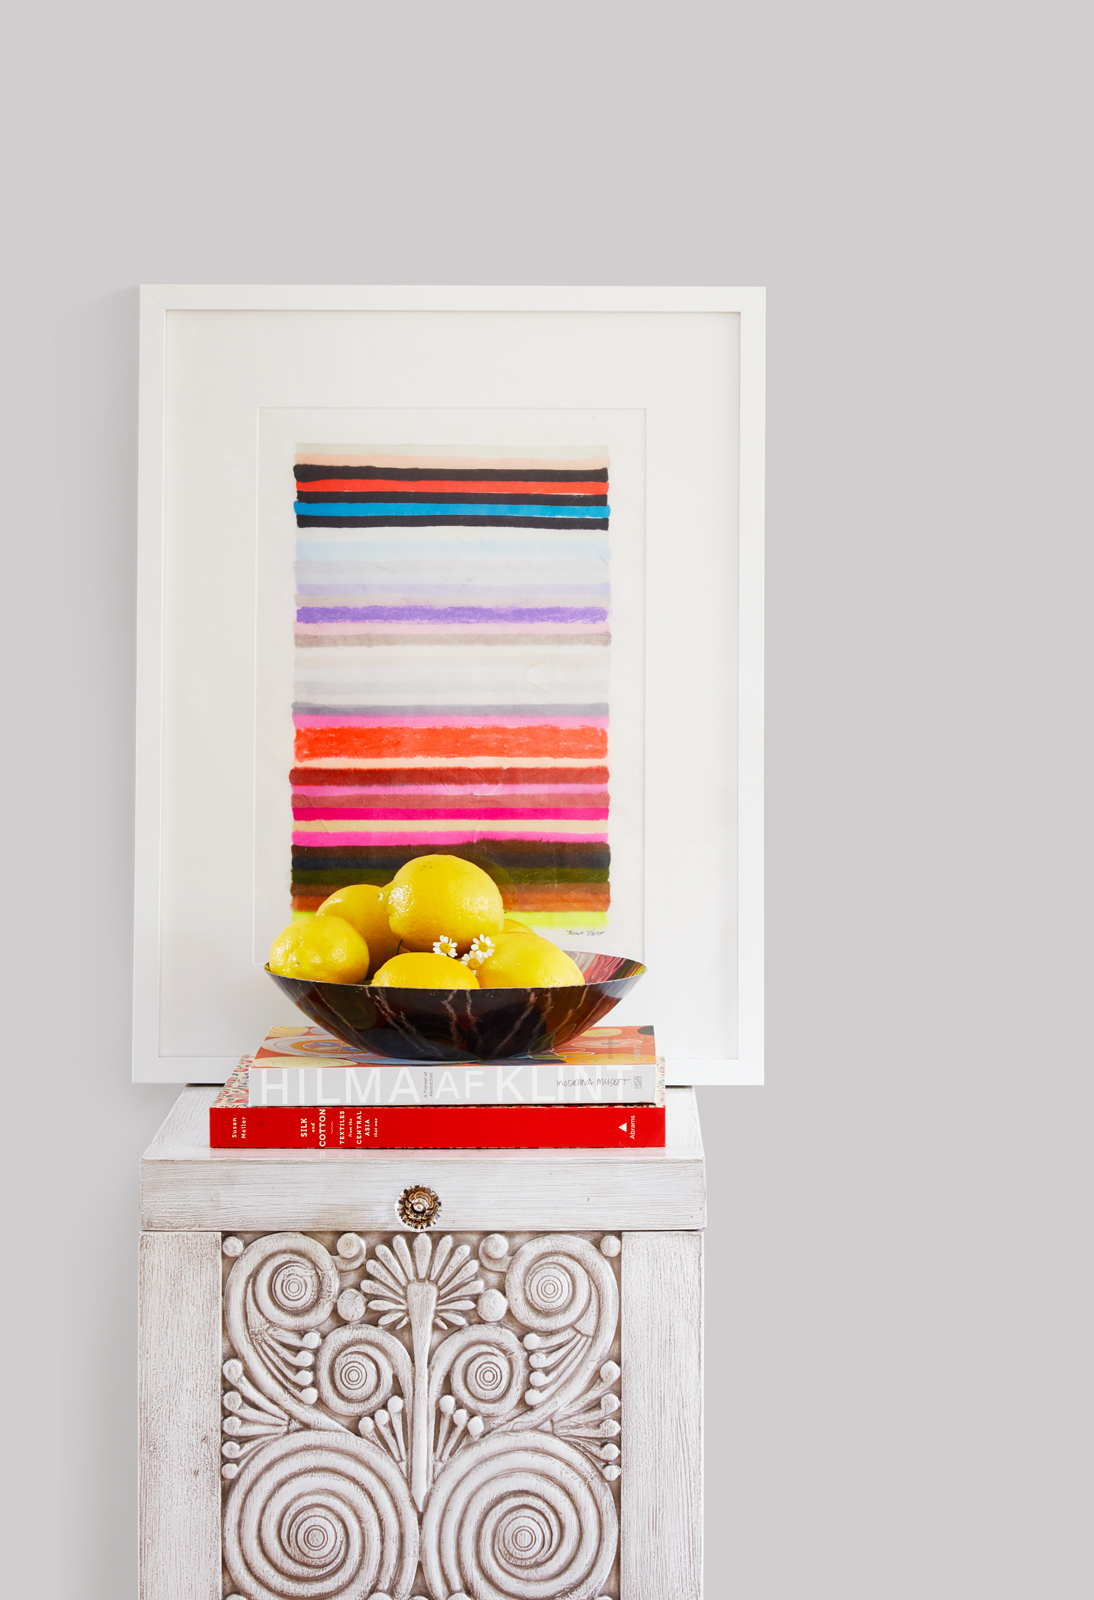 Kristi-Kohut-art-homes-colorful993.jpg